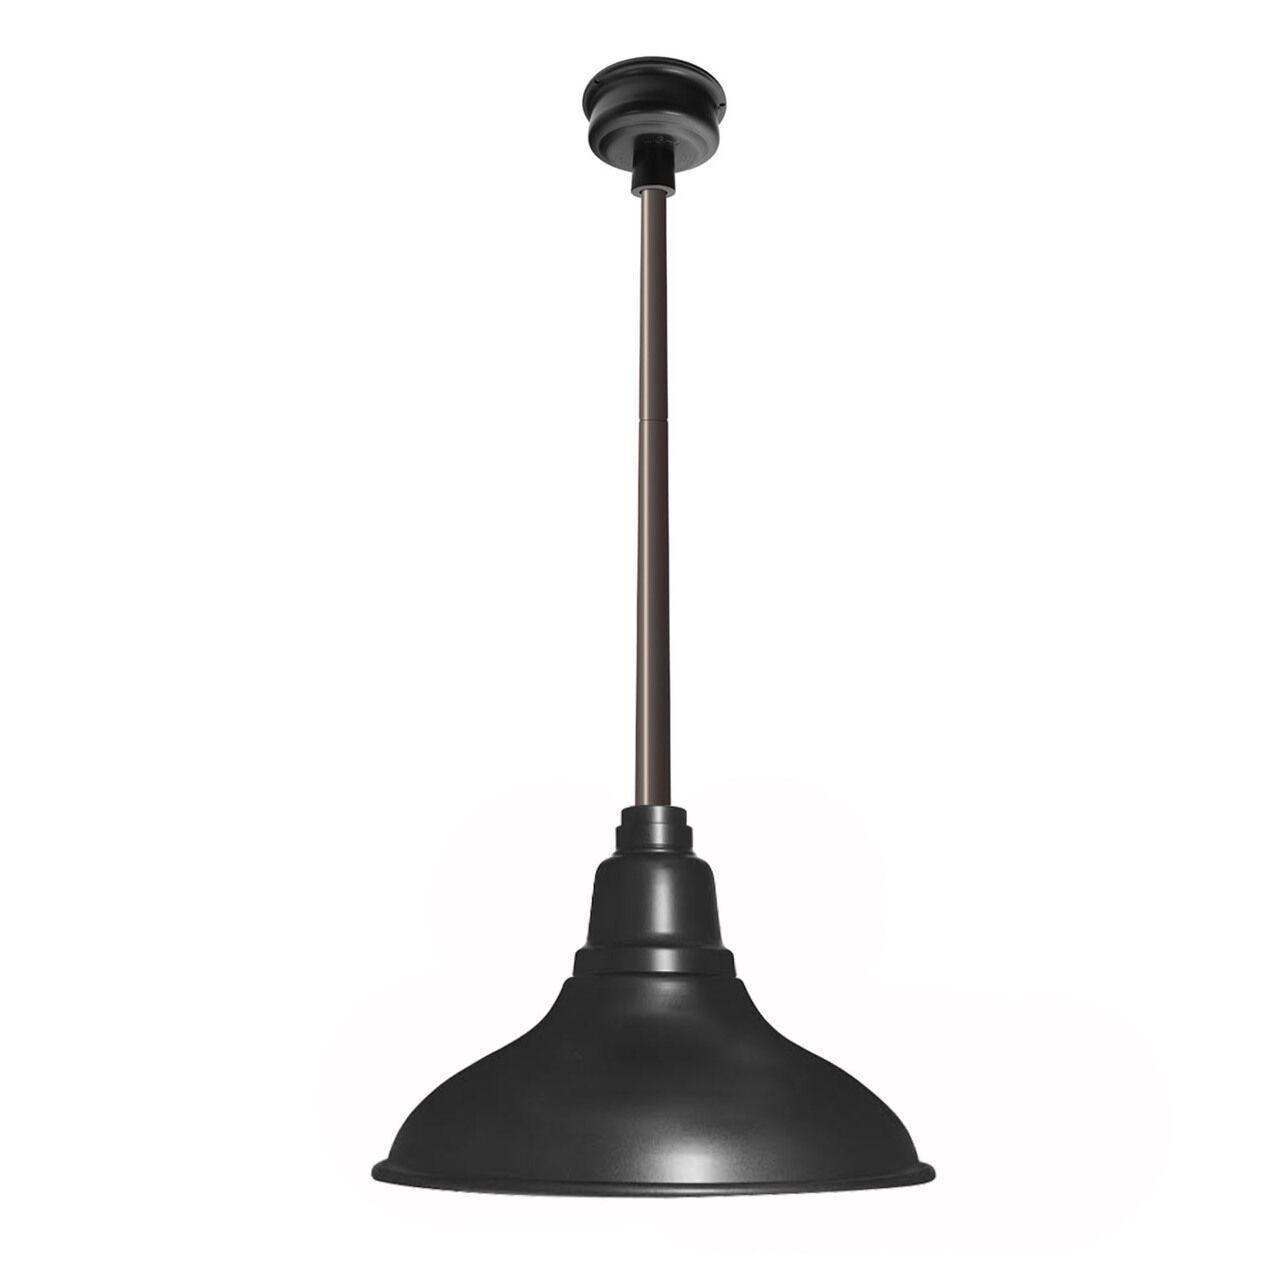 Idella Outdoor 1-Light  LED Dome Pendant Finish: Matte Black with Mahogany Bronze Downrod, Size: 9